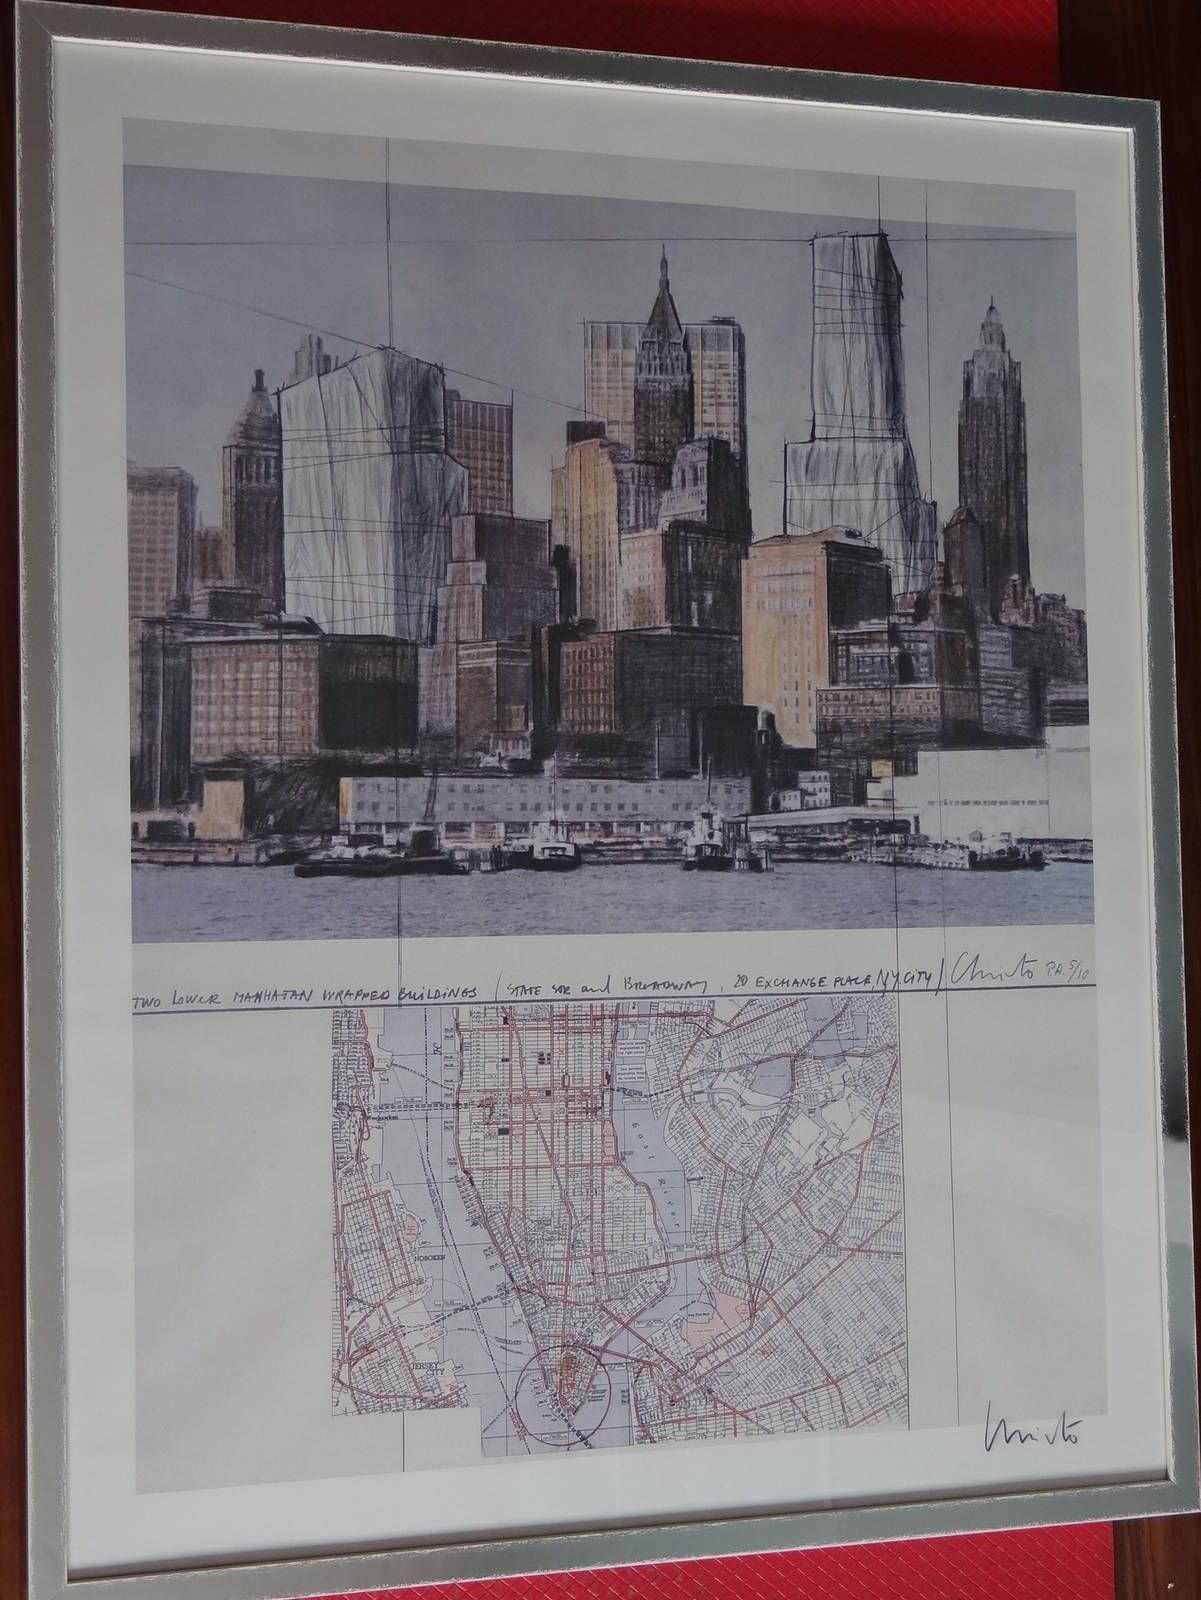 Christo Two Lower Manhattan